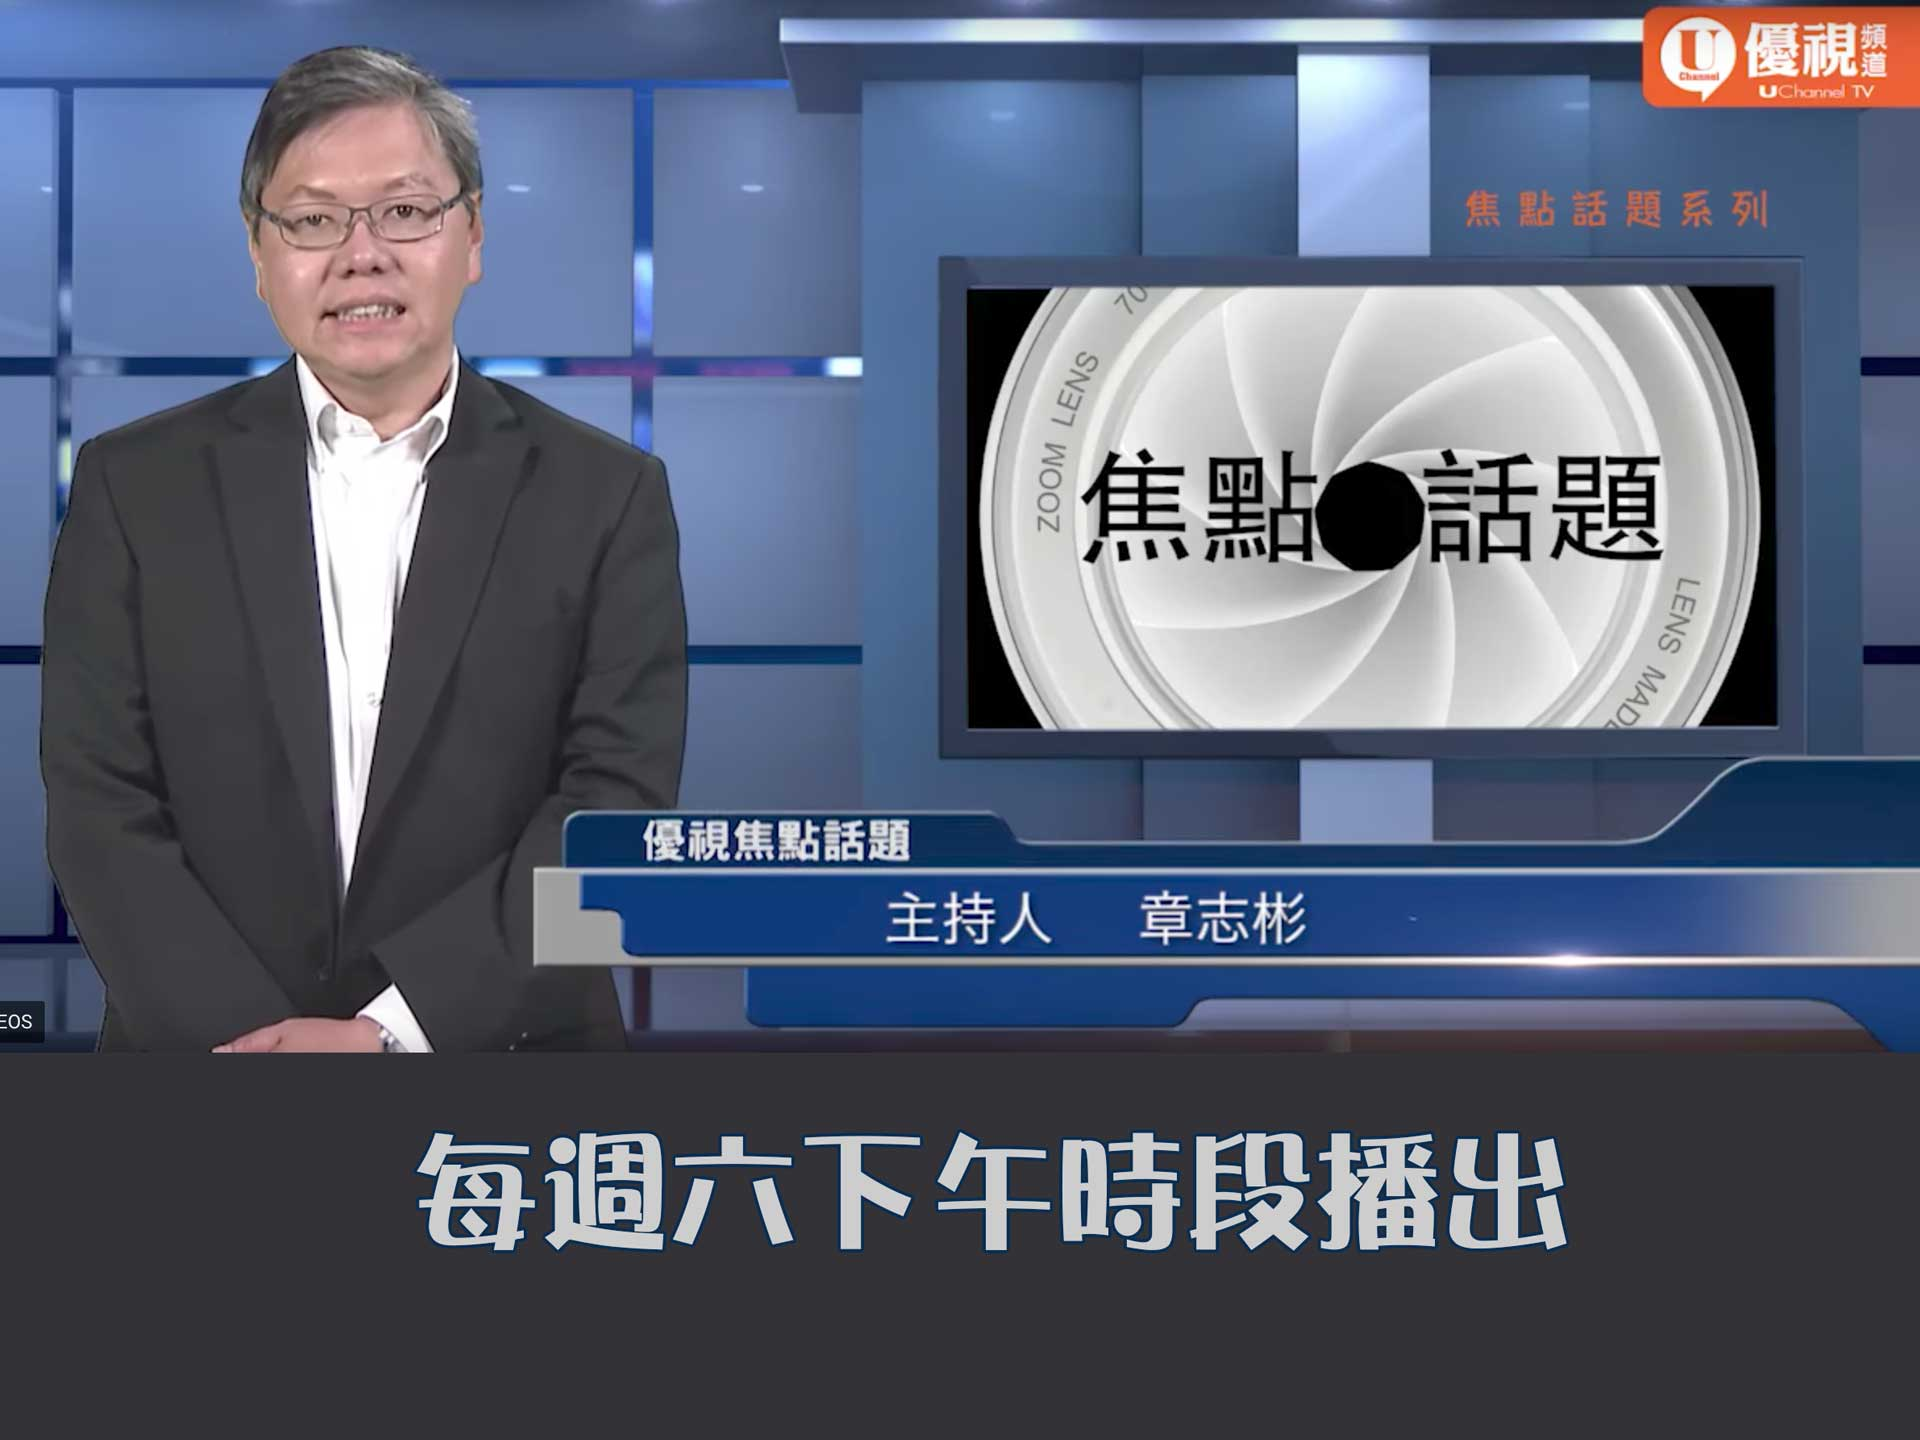 Focus News